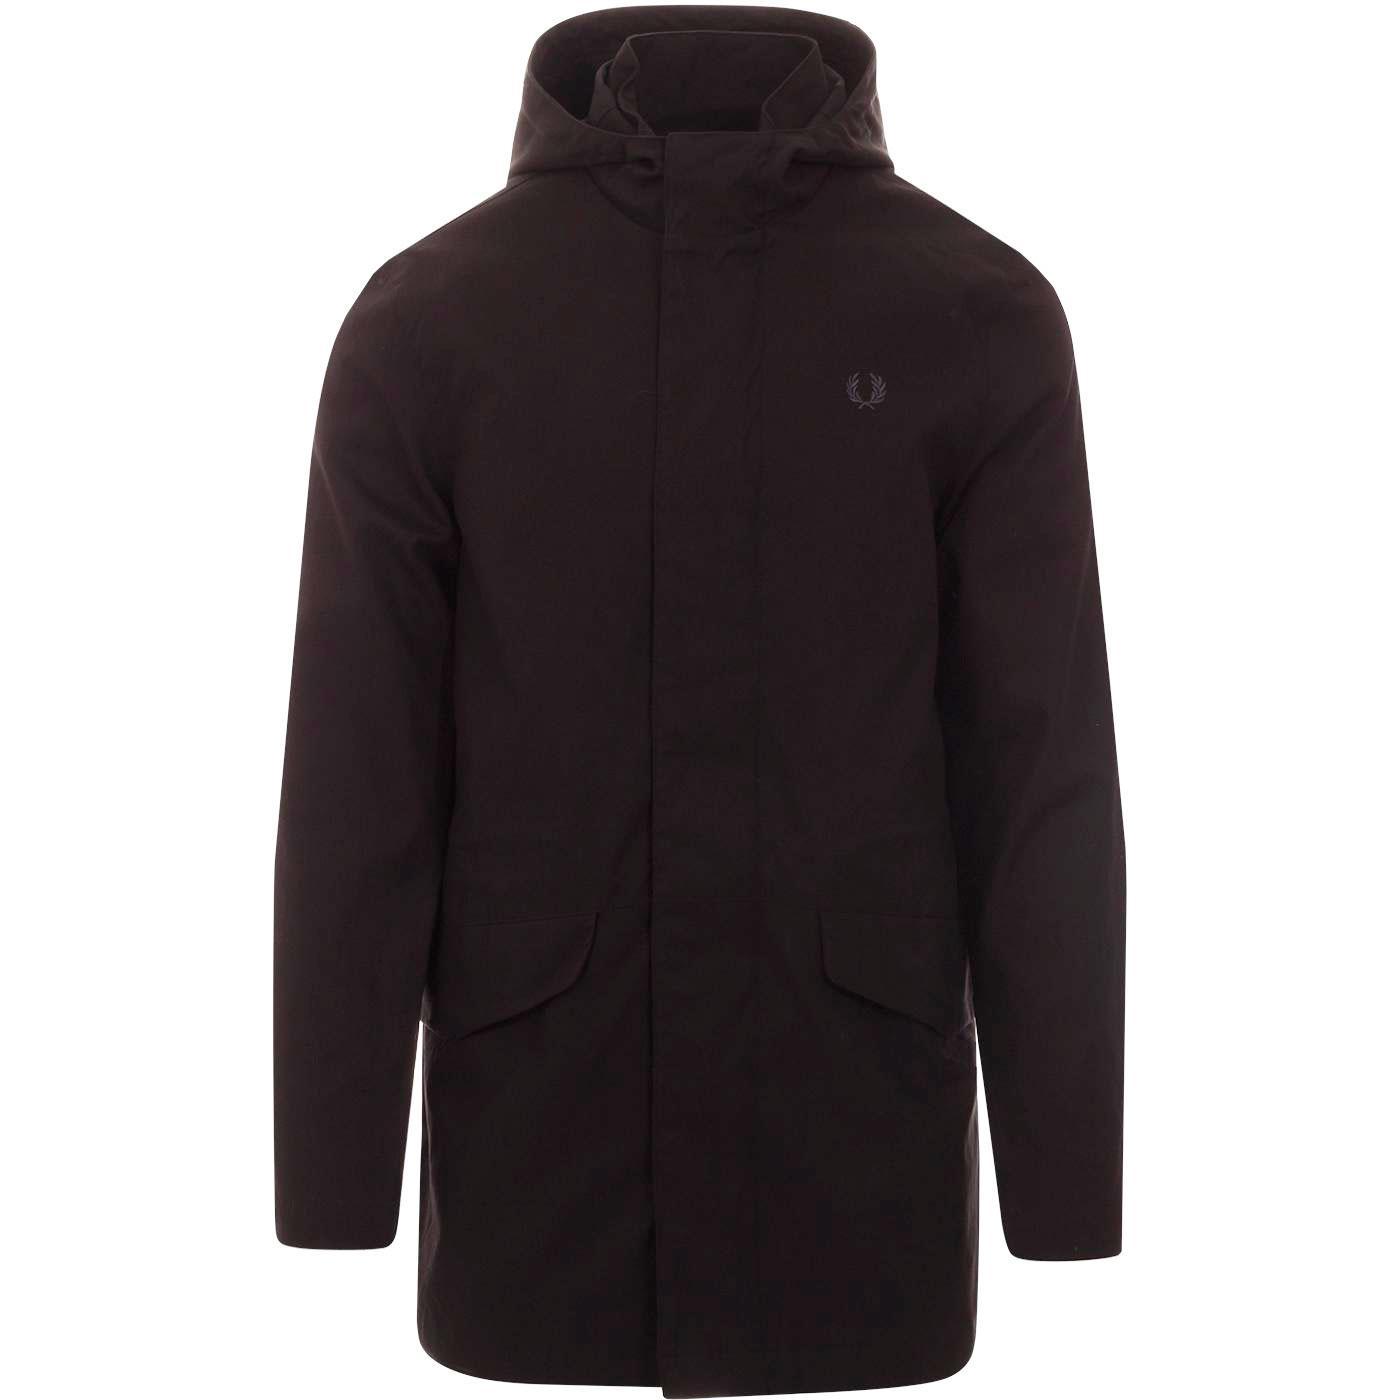 FRED PERRY Retro Mod Fishtail Parka Jacket (Black)